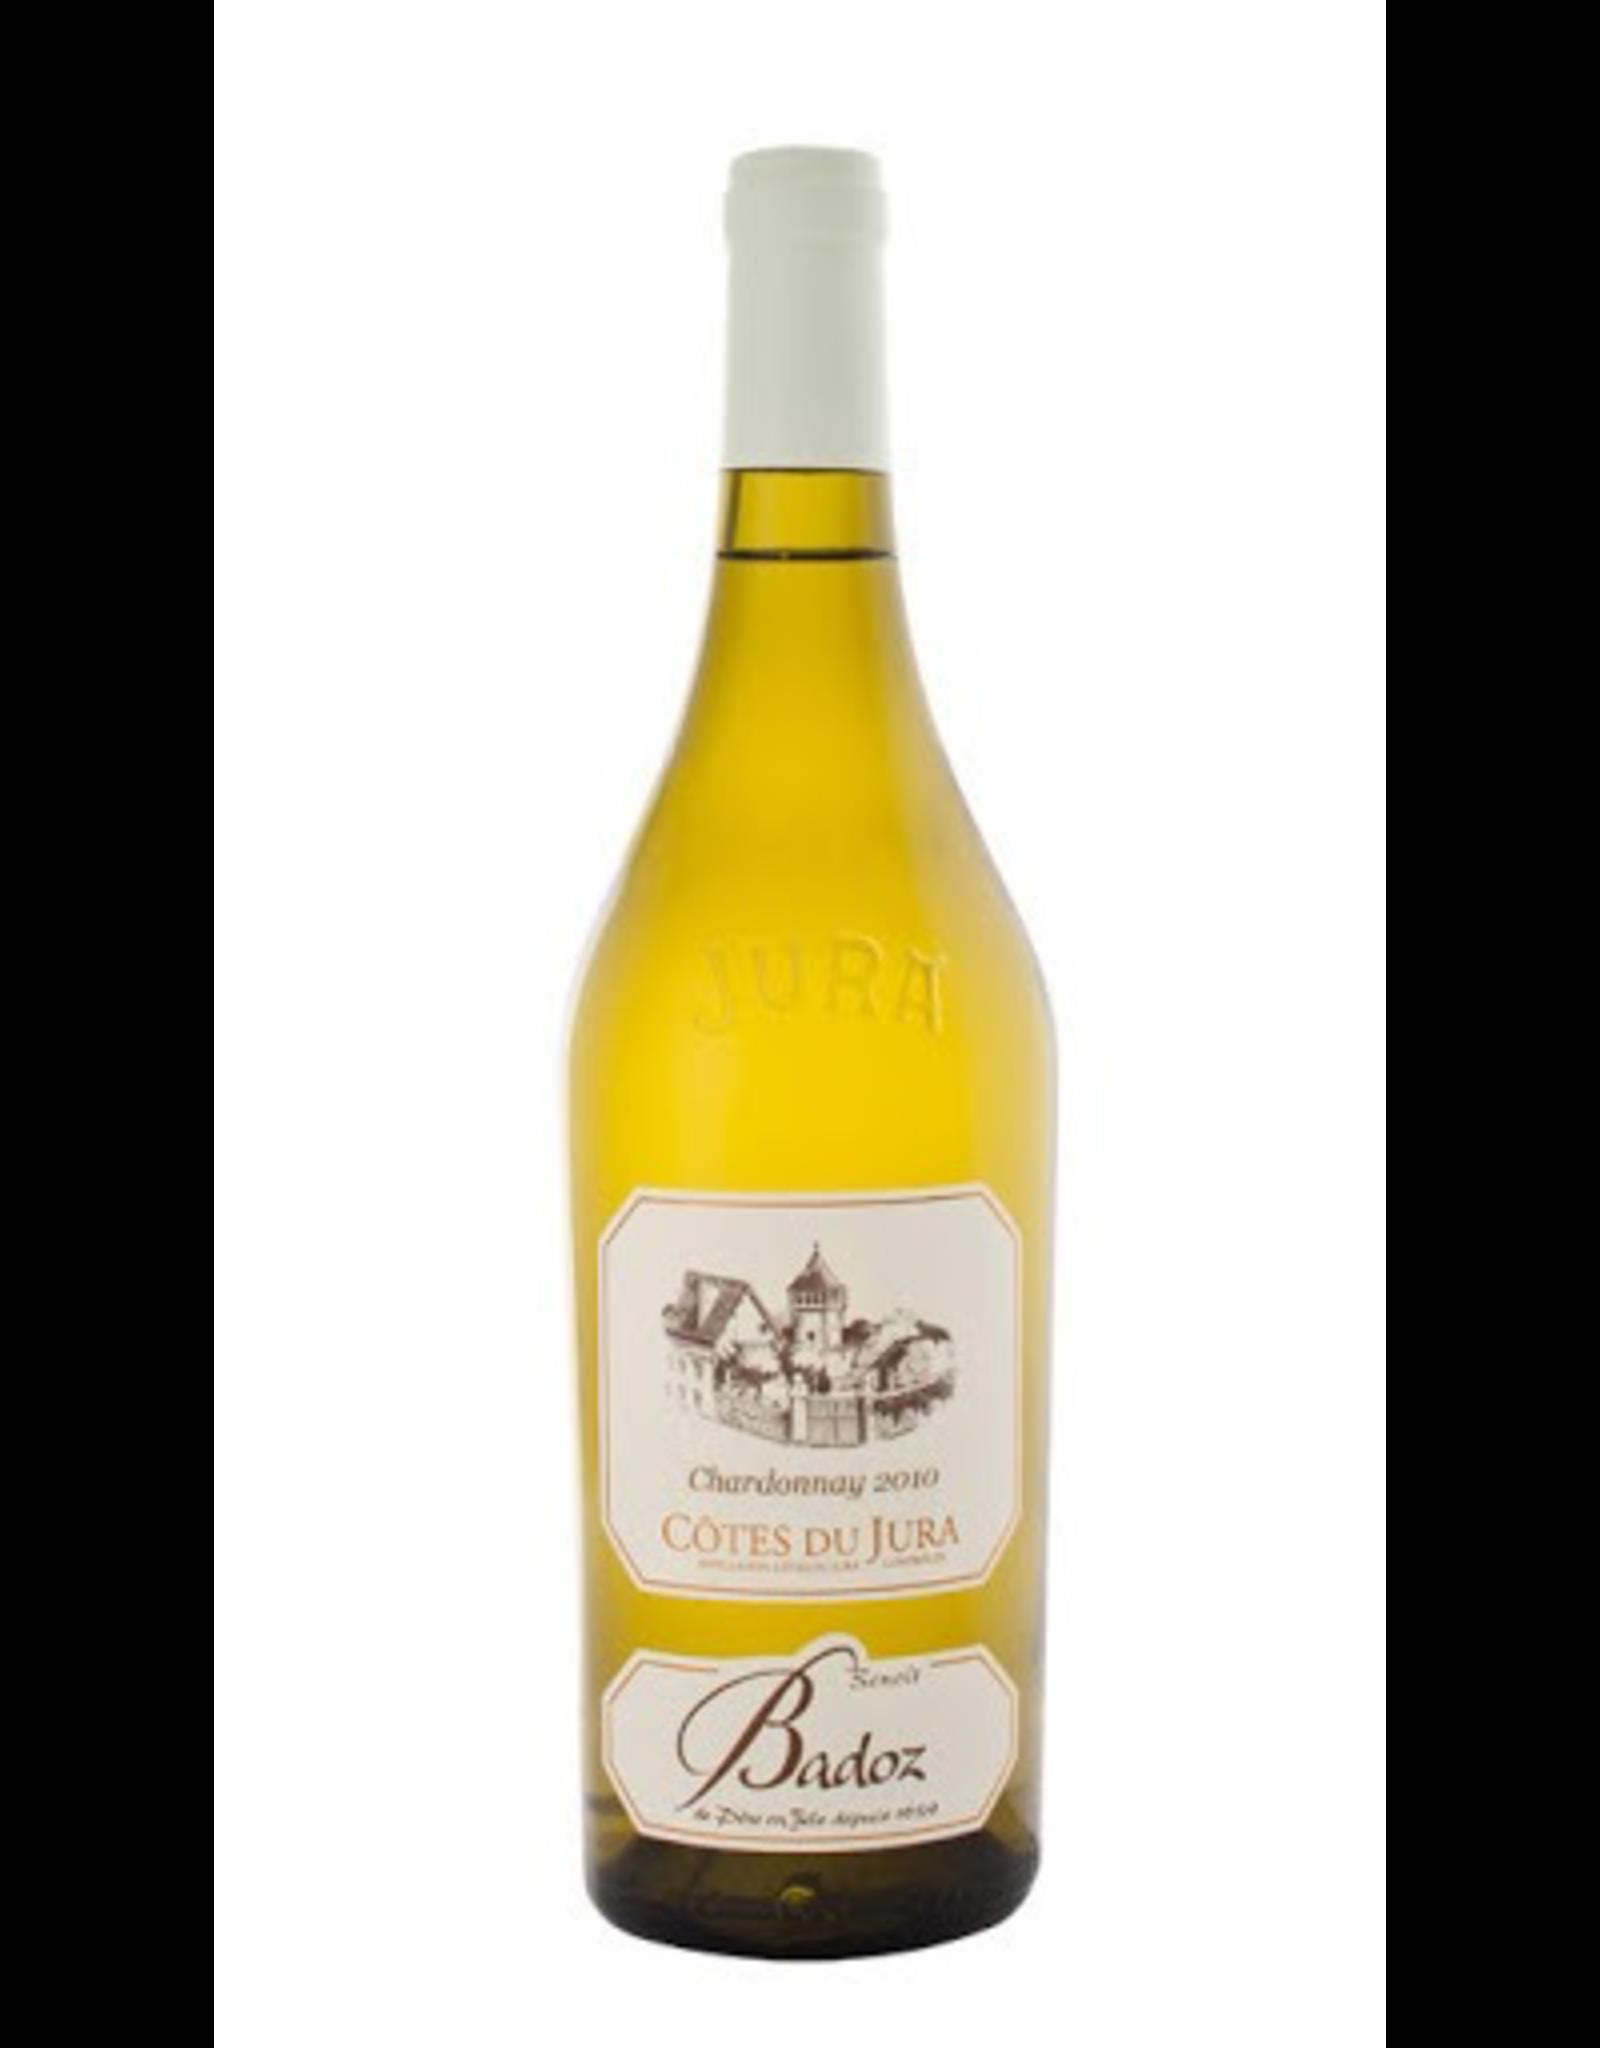 White Wine 2013, Benoit Badoz, Chardonnay, Cotes du Jura, Jura, France, 12.5% Alc, CTnr, TW92